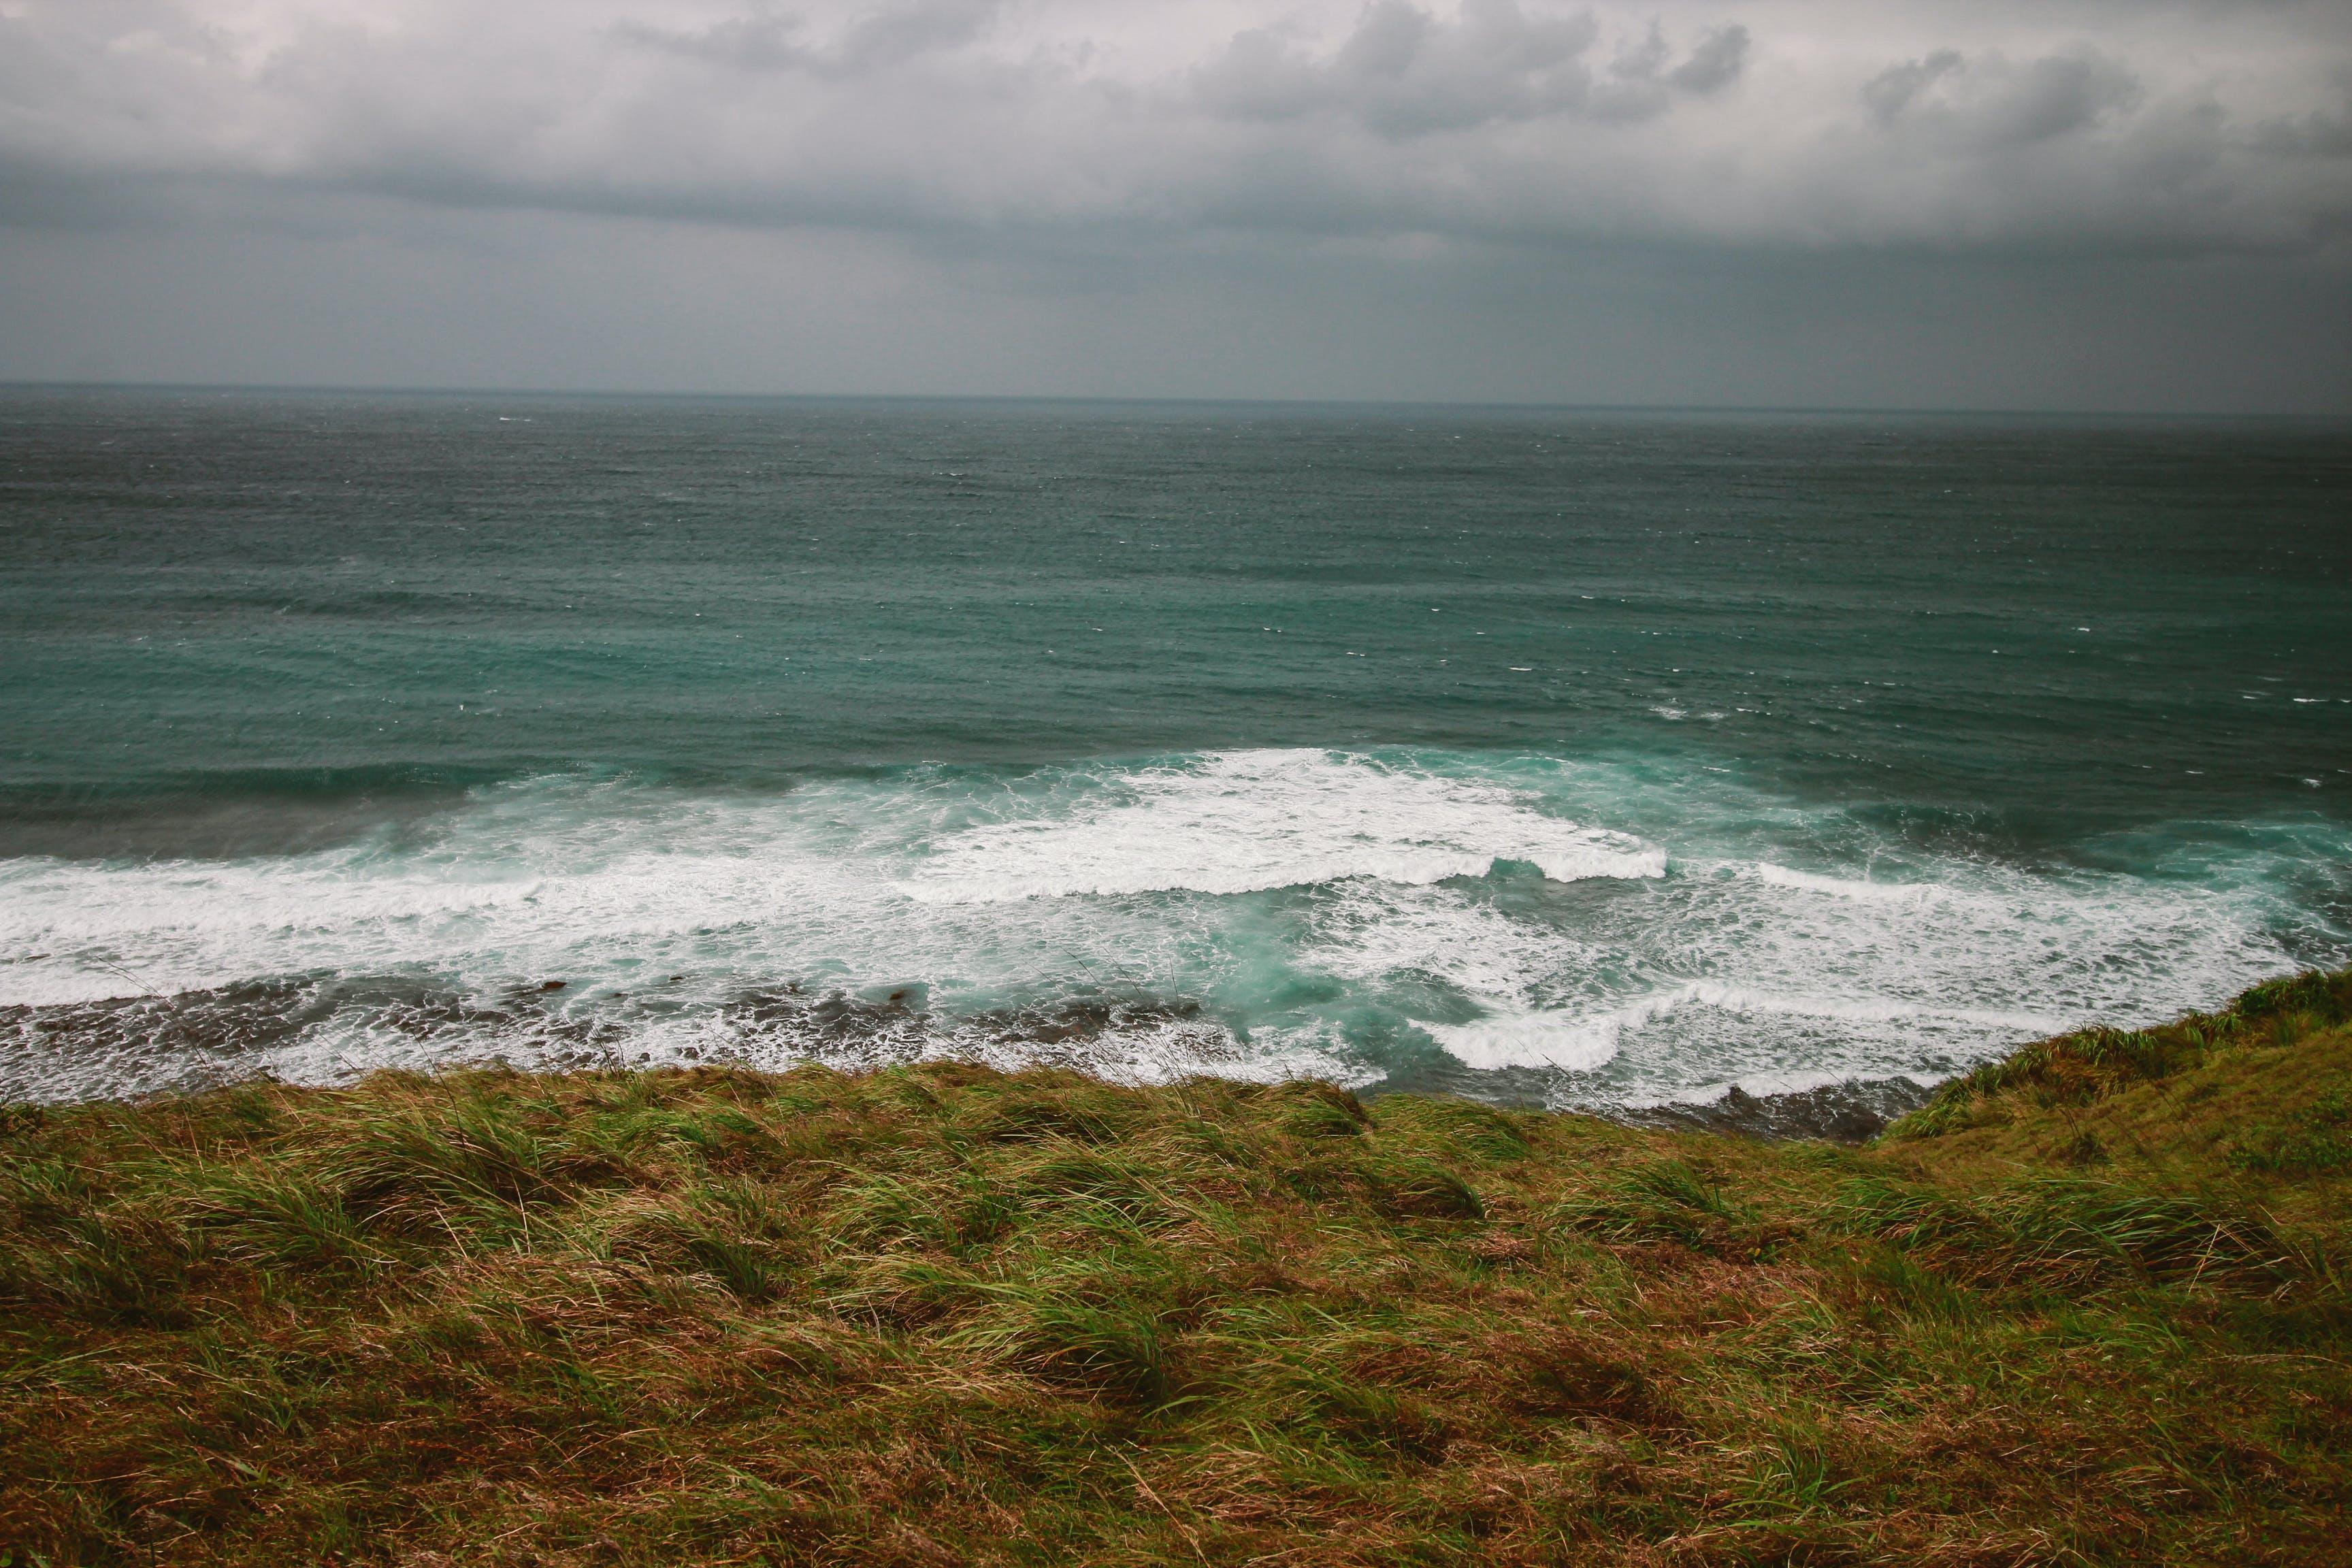 Landscape View of Seashore